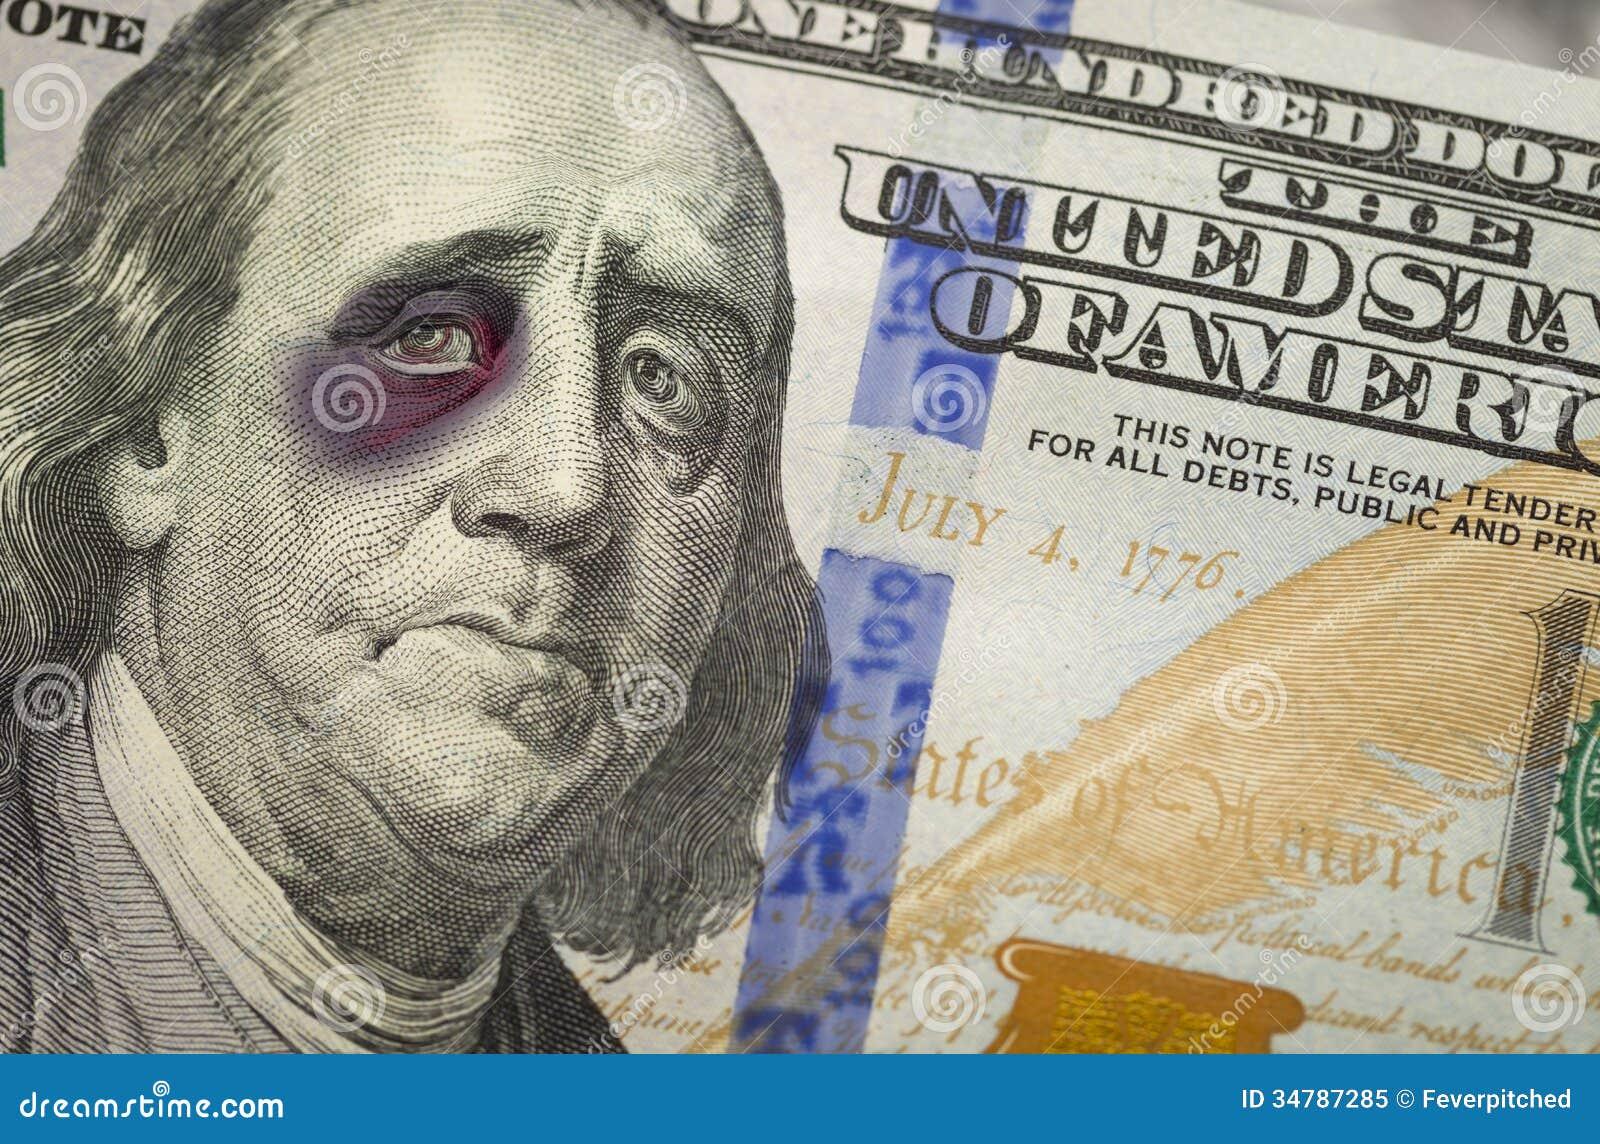 how to get new dollar bills